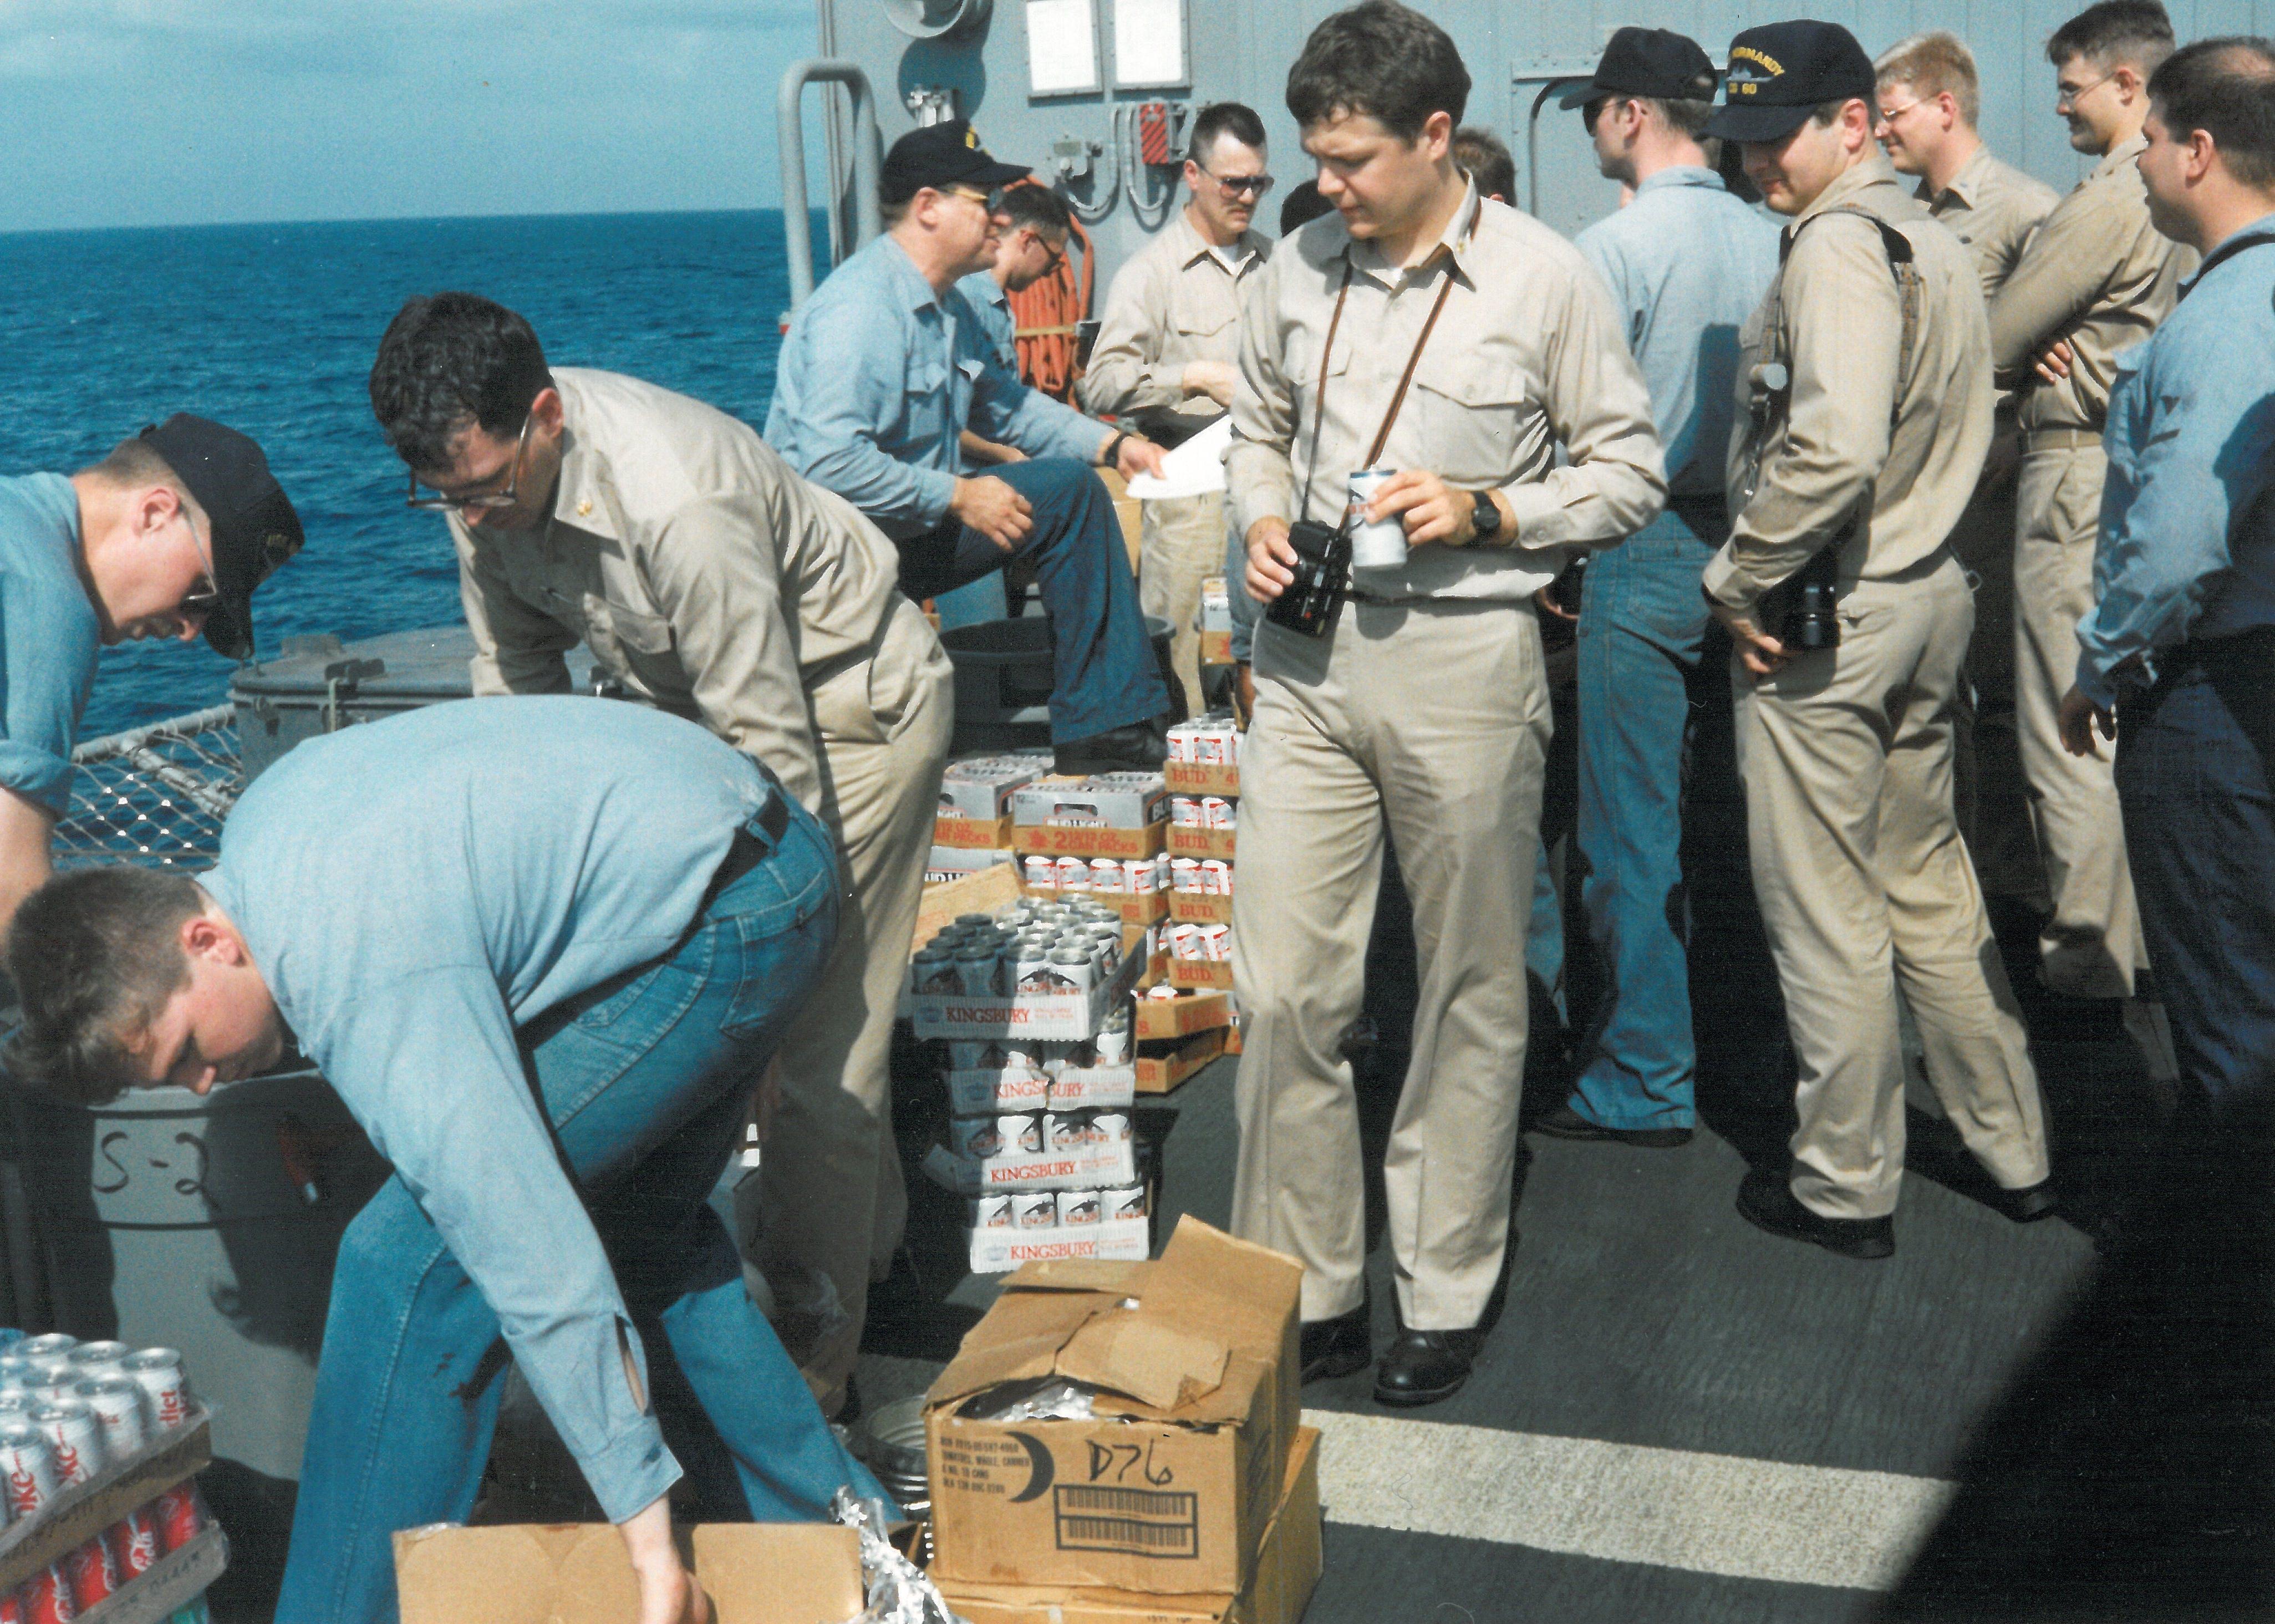 Sailors enjoy a beer day